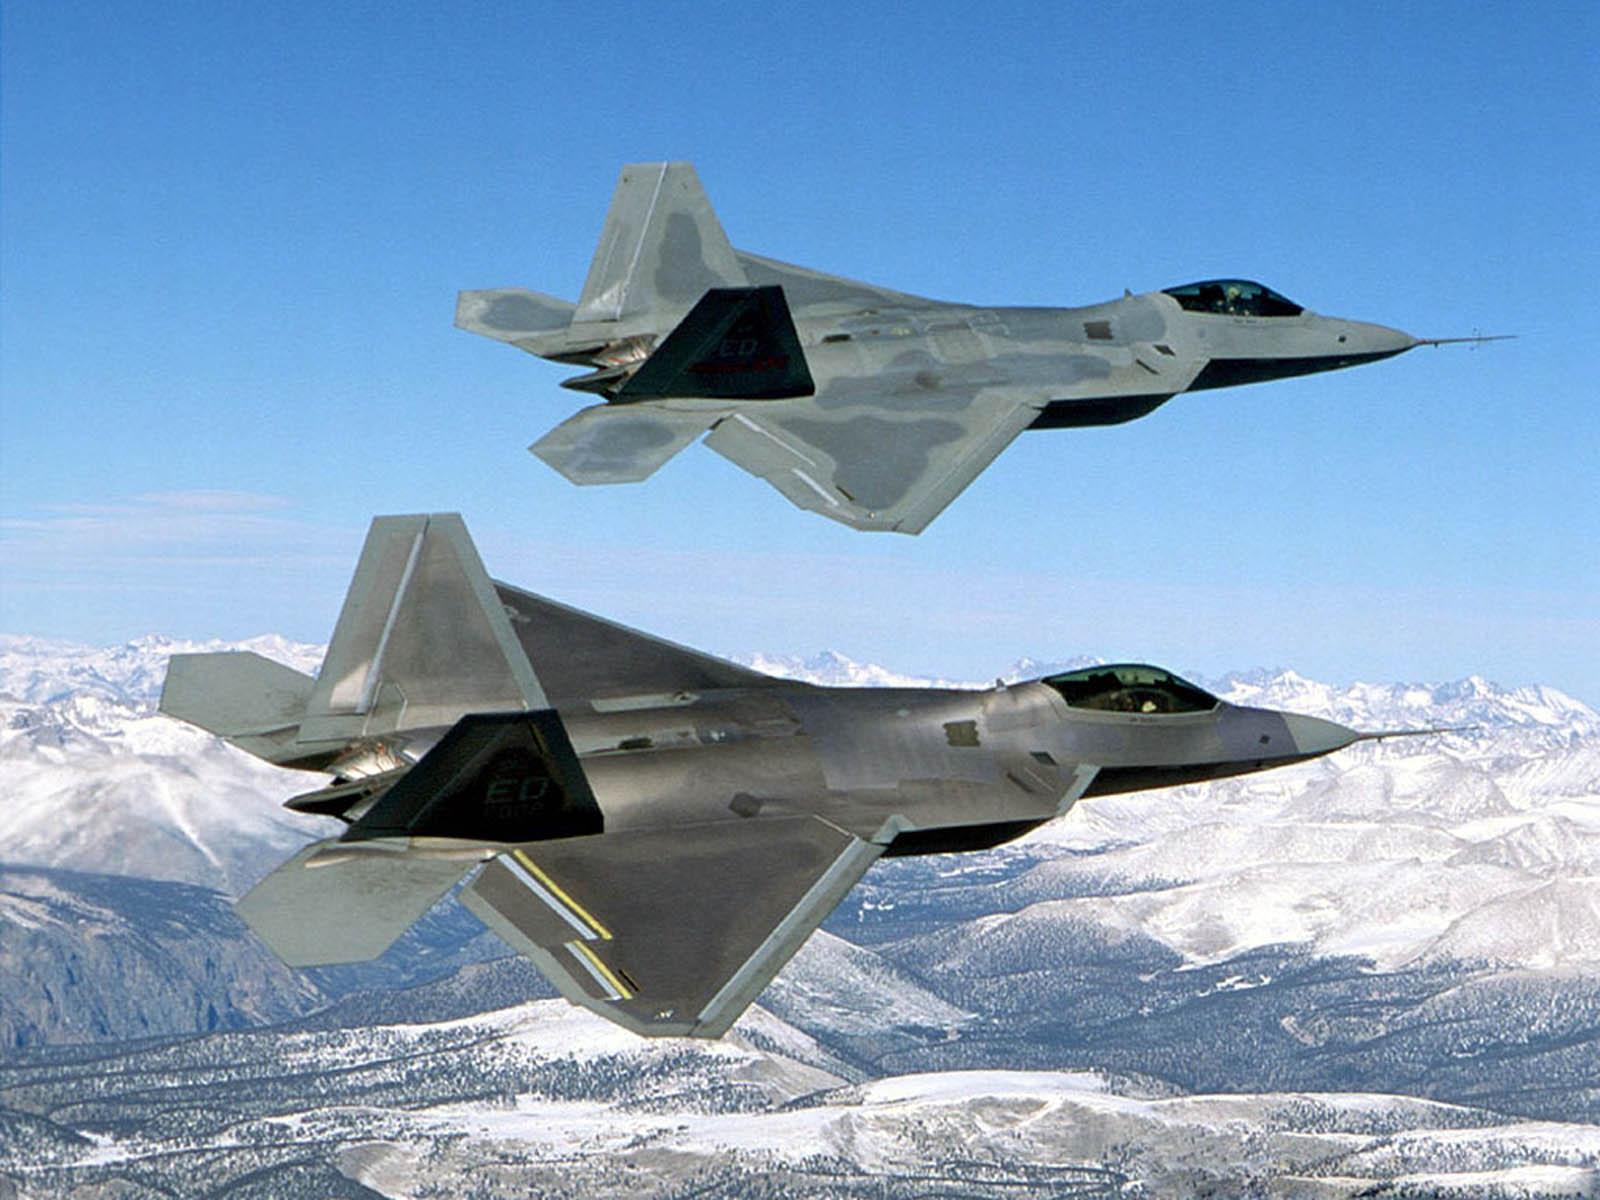 wallpapers f 22 raptor military jet fighter desktop wallpapers f 22 1600x1200